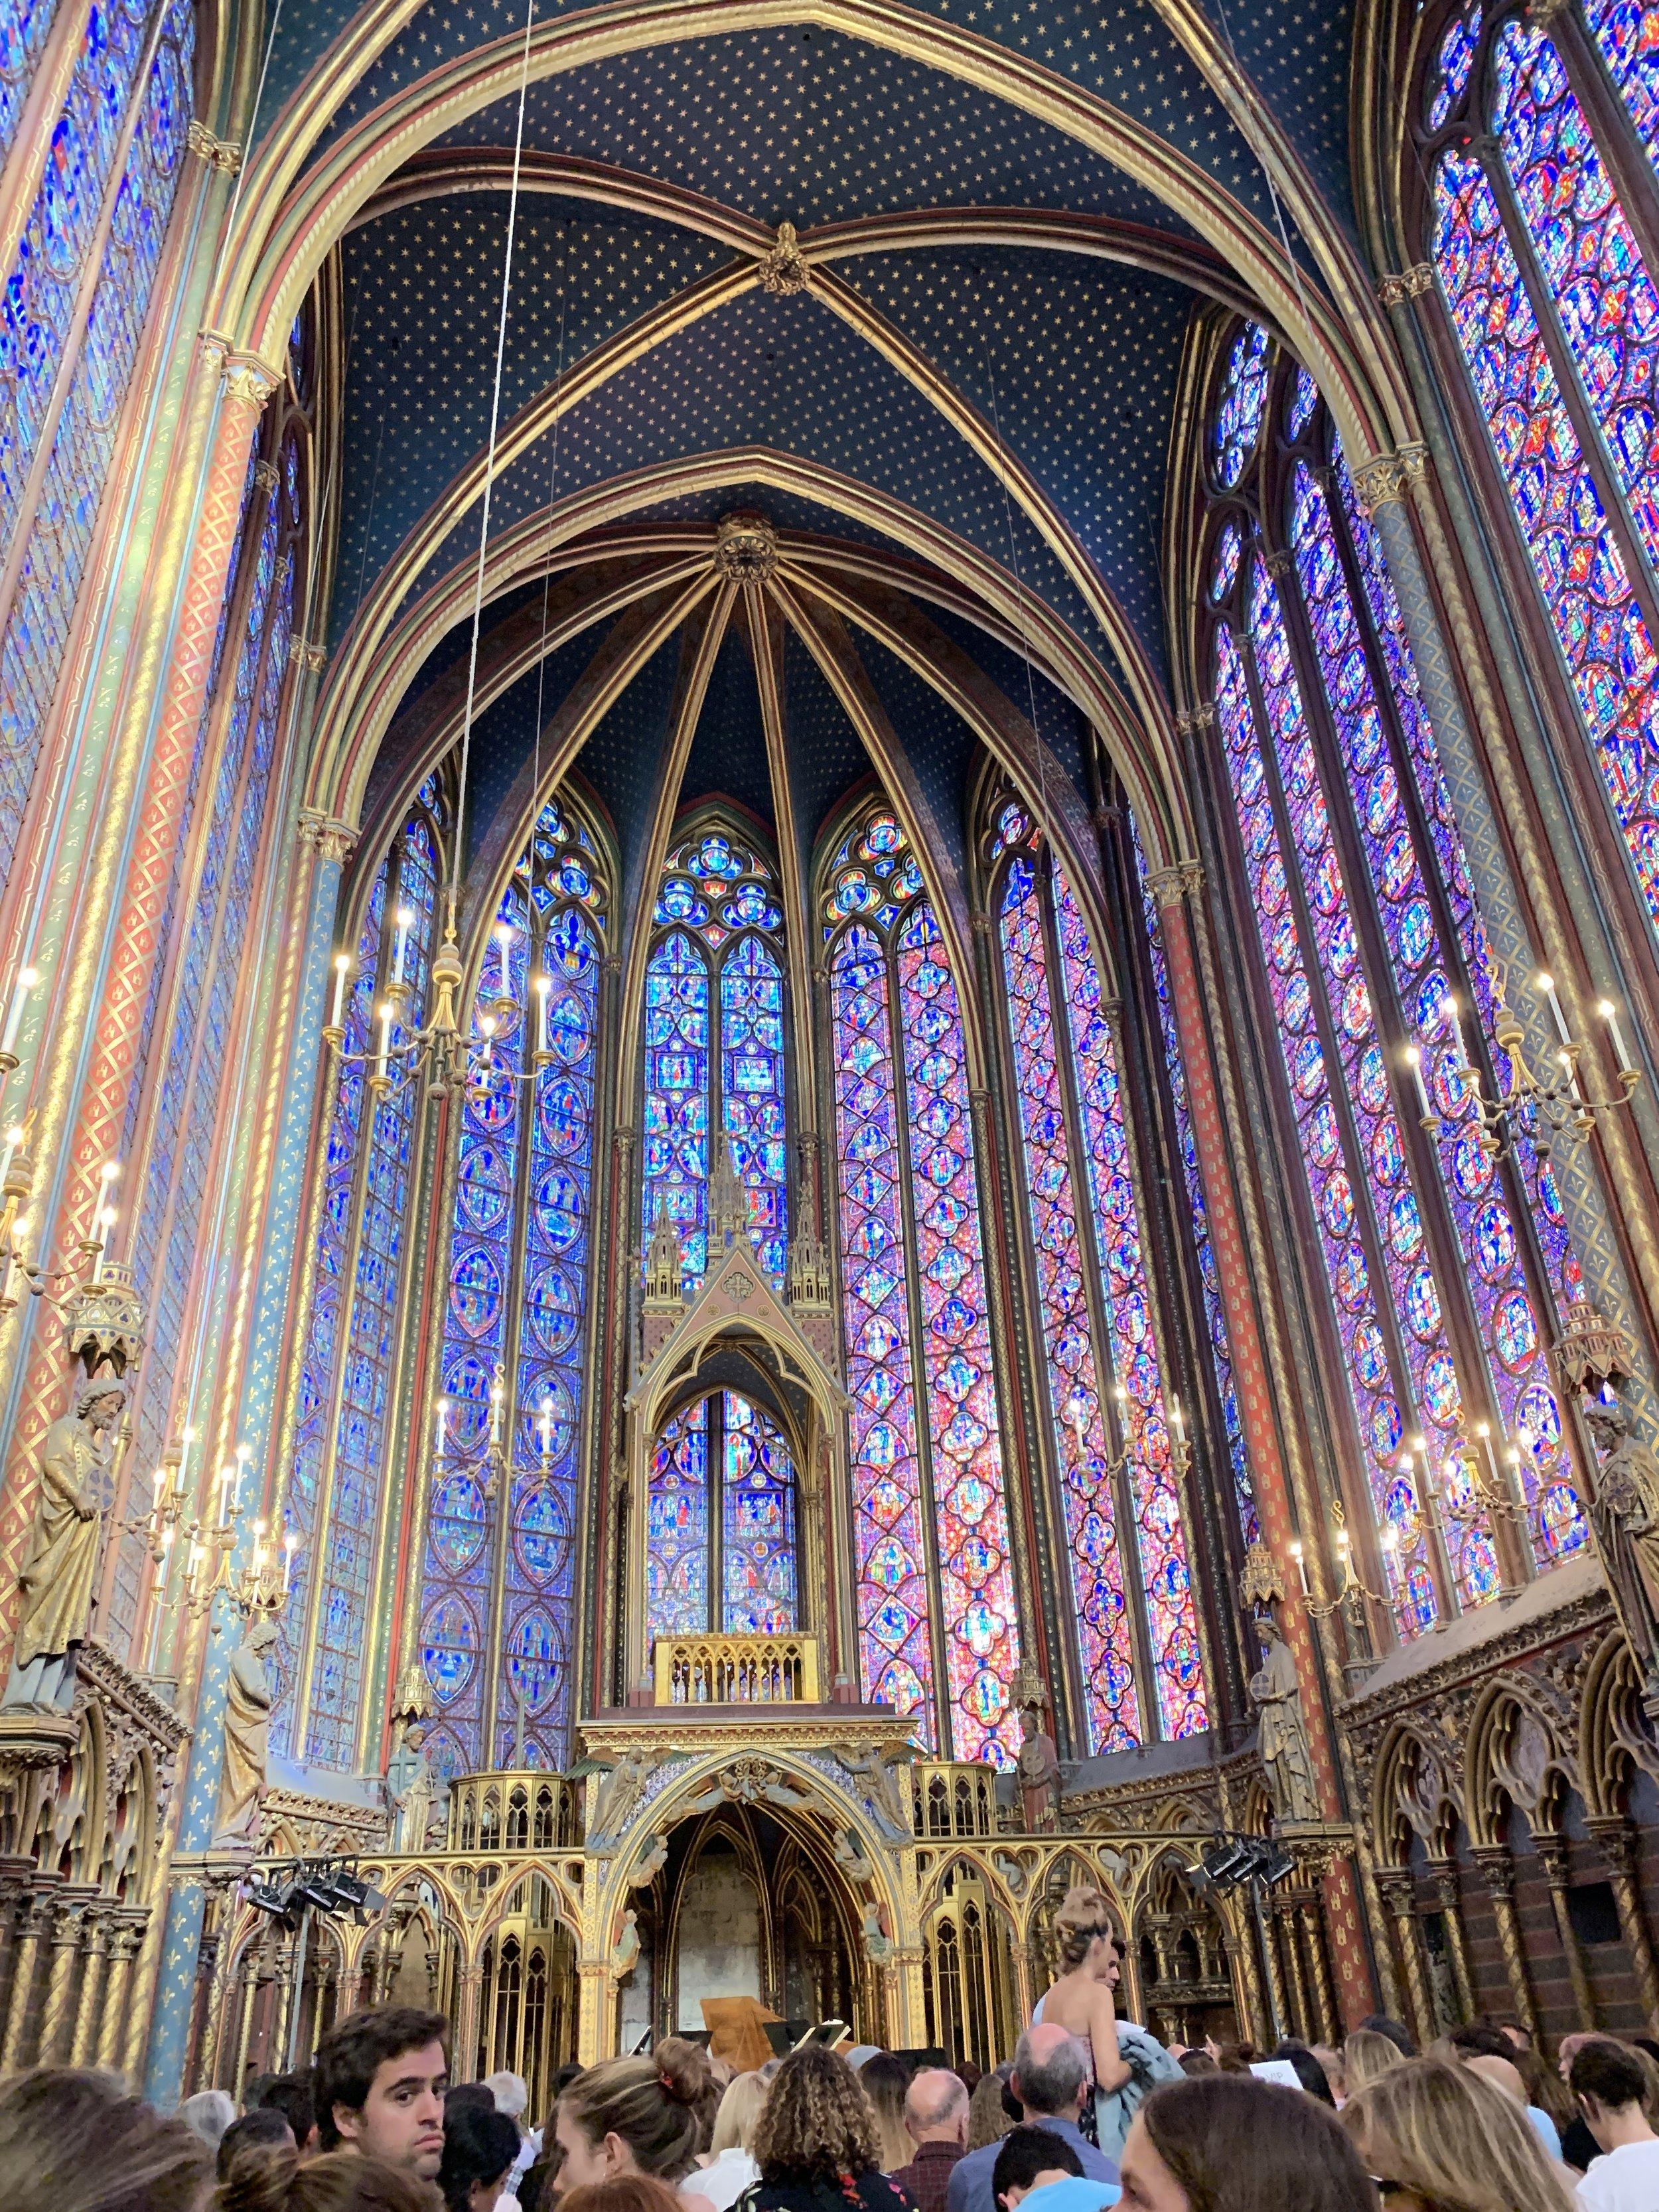 Vivaldi concert at St. Chapelle